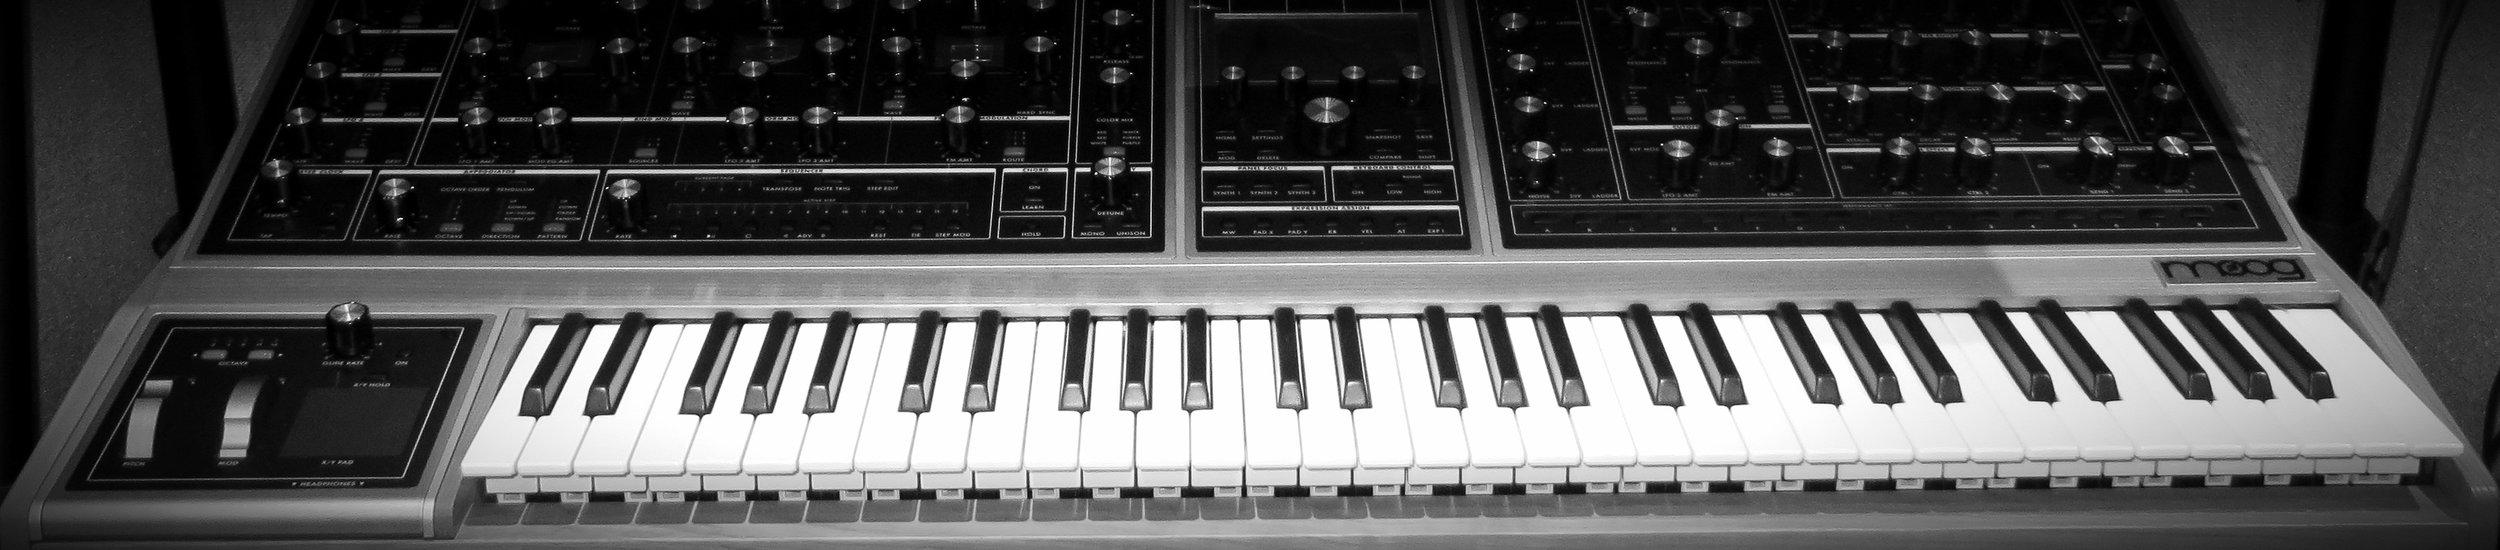 B&W Moog One.jpg